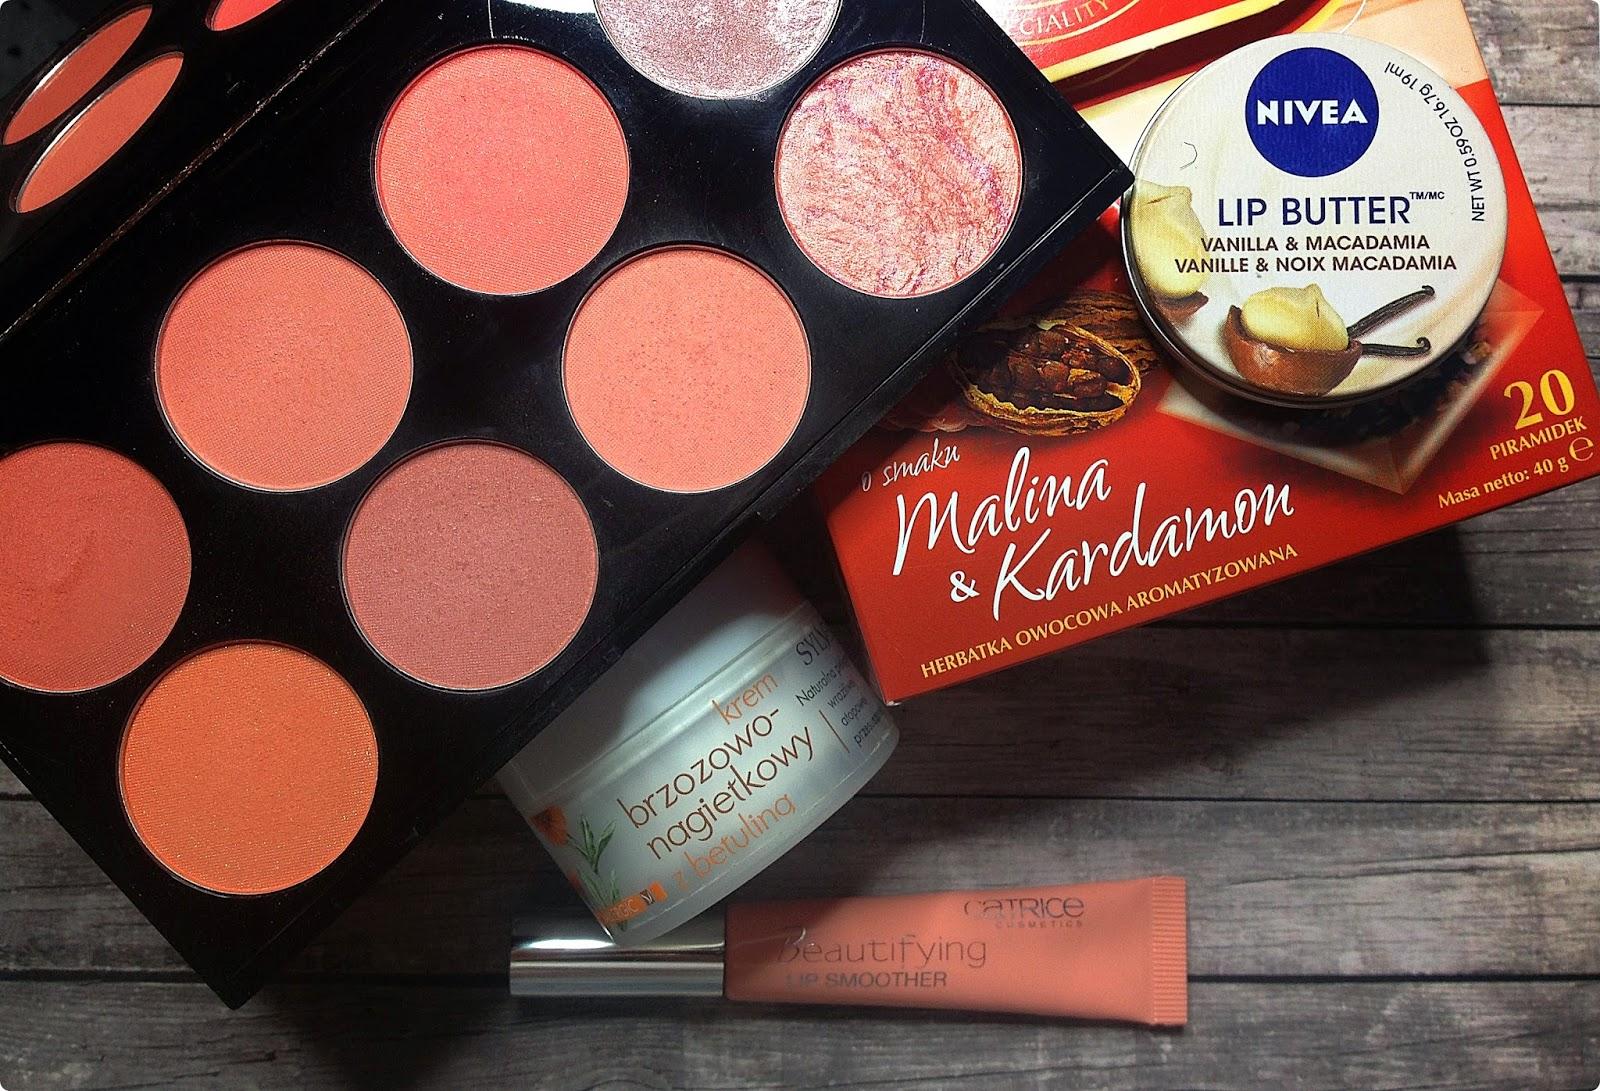 Ulubieńcy lutego: Catrice, Nivea, Makeup Revlolution, Sylveco i herbata z Biedronki!